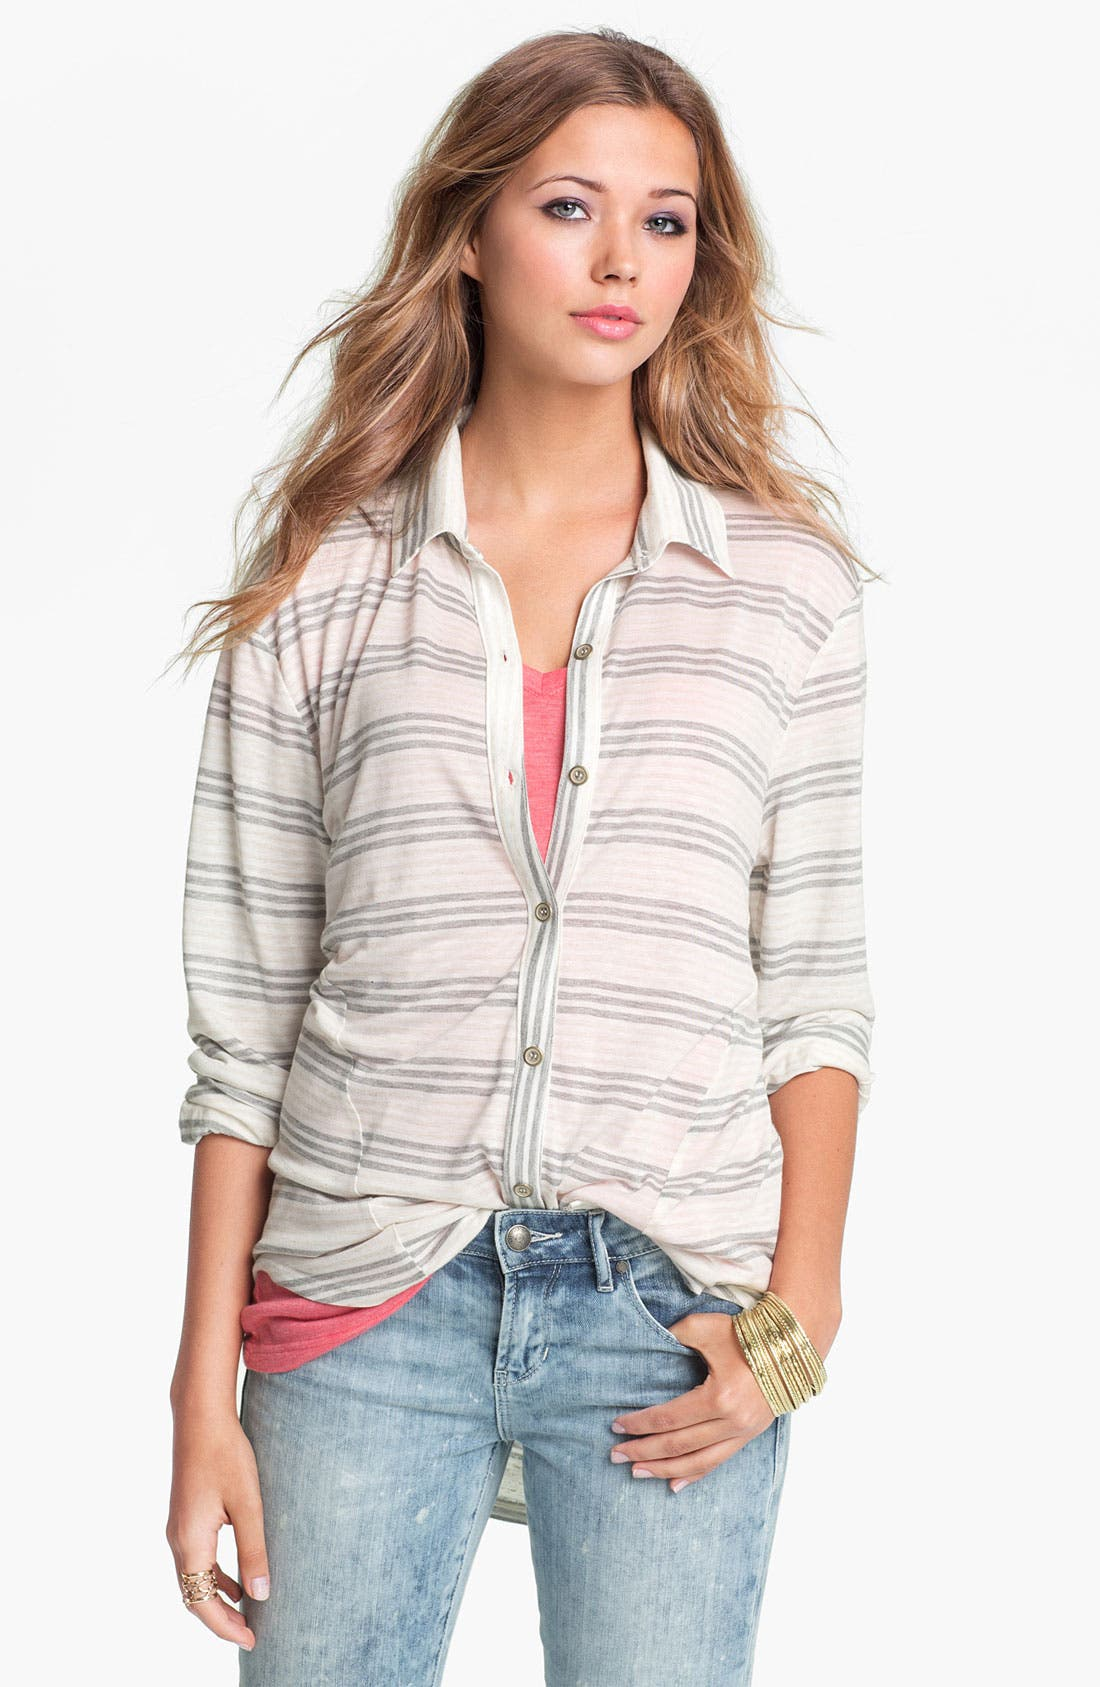 Alternate Image 1 Selected - Love on a Hanger Knit Shirt (Juniors)